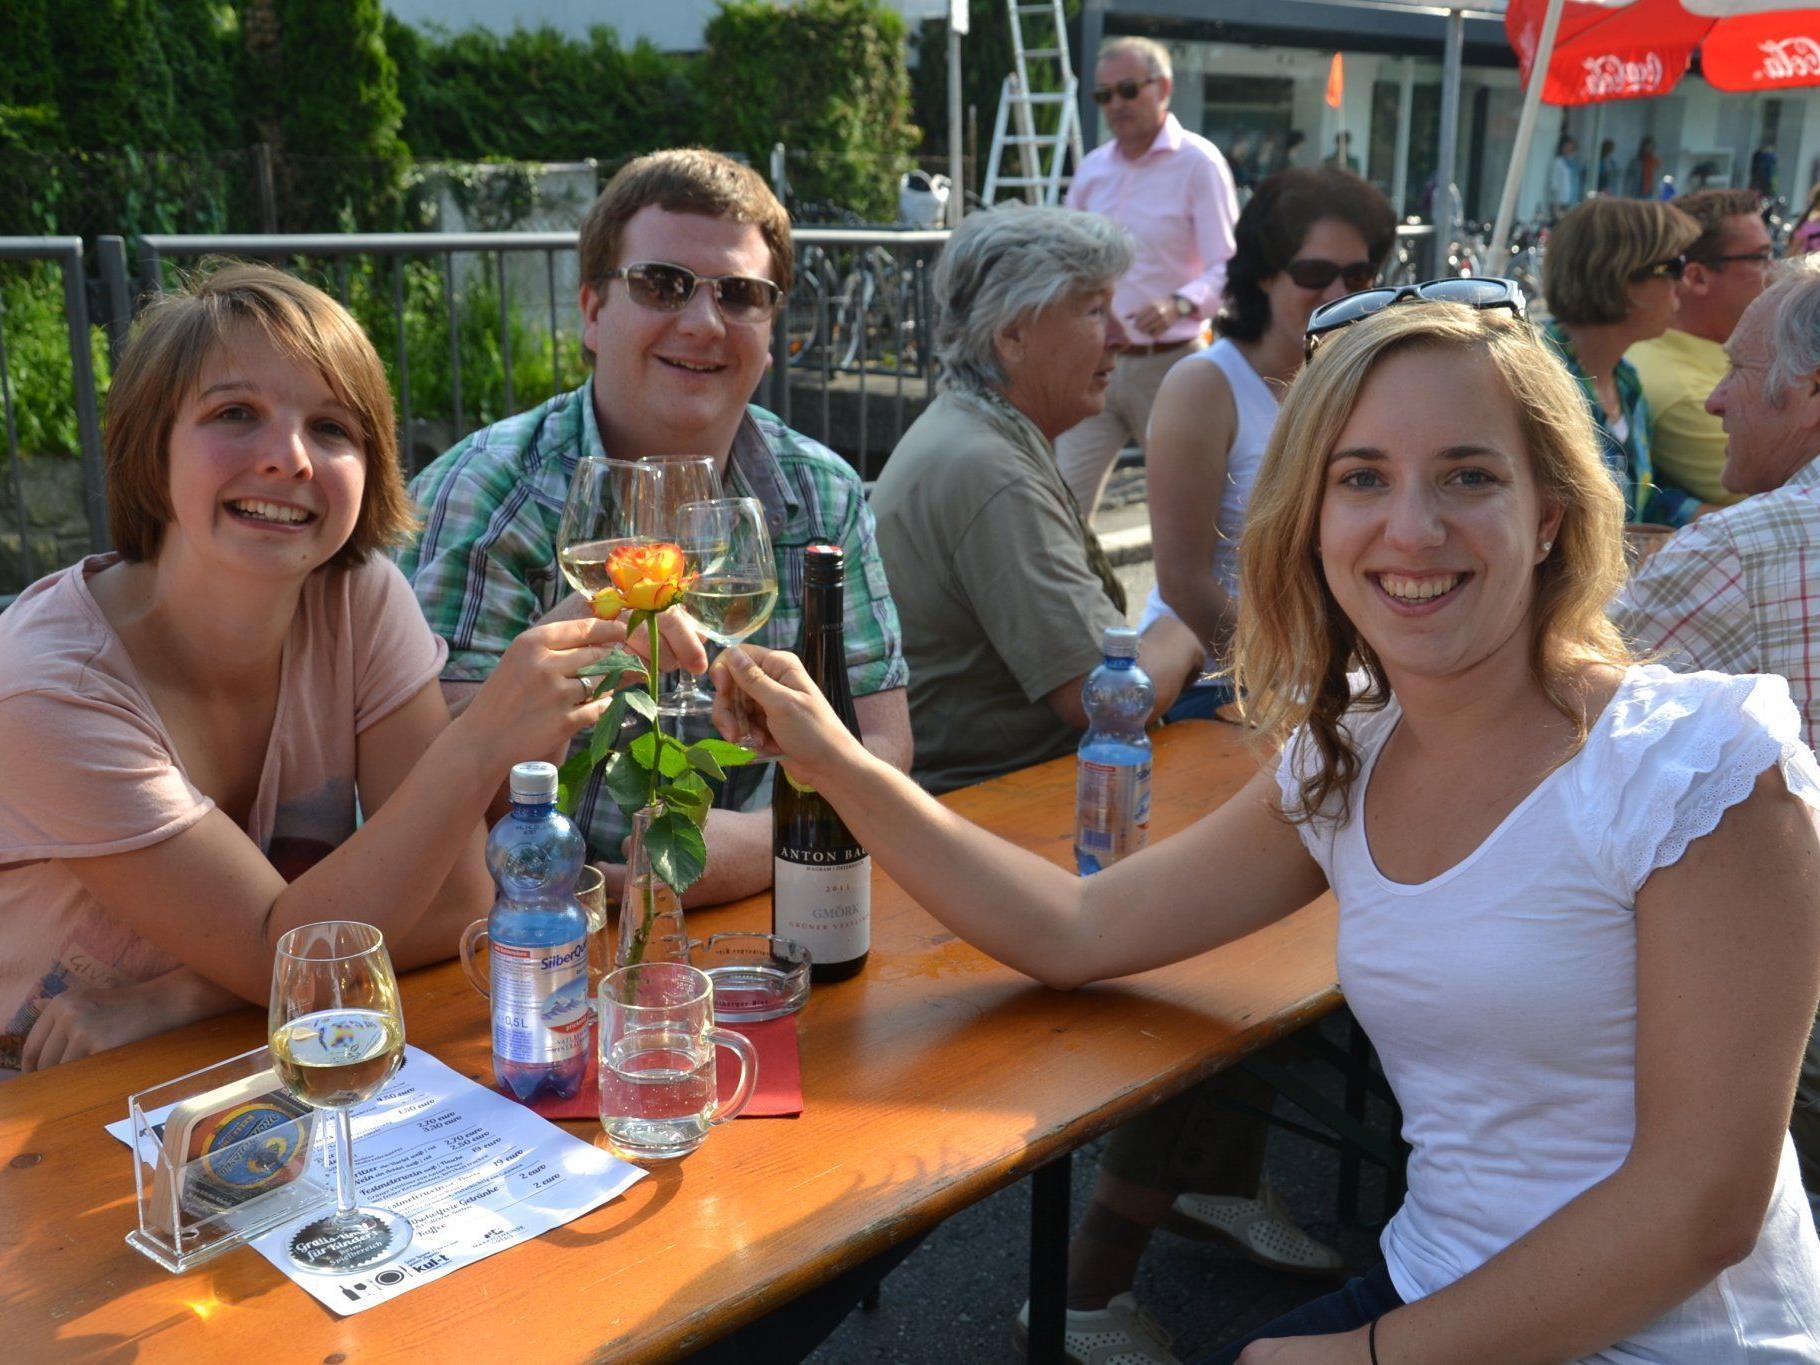 (v.l.) Juliane, Mathias & Christina feierten in Götzis mit